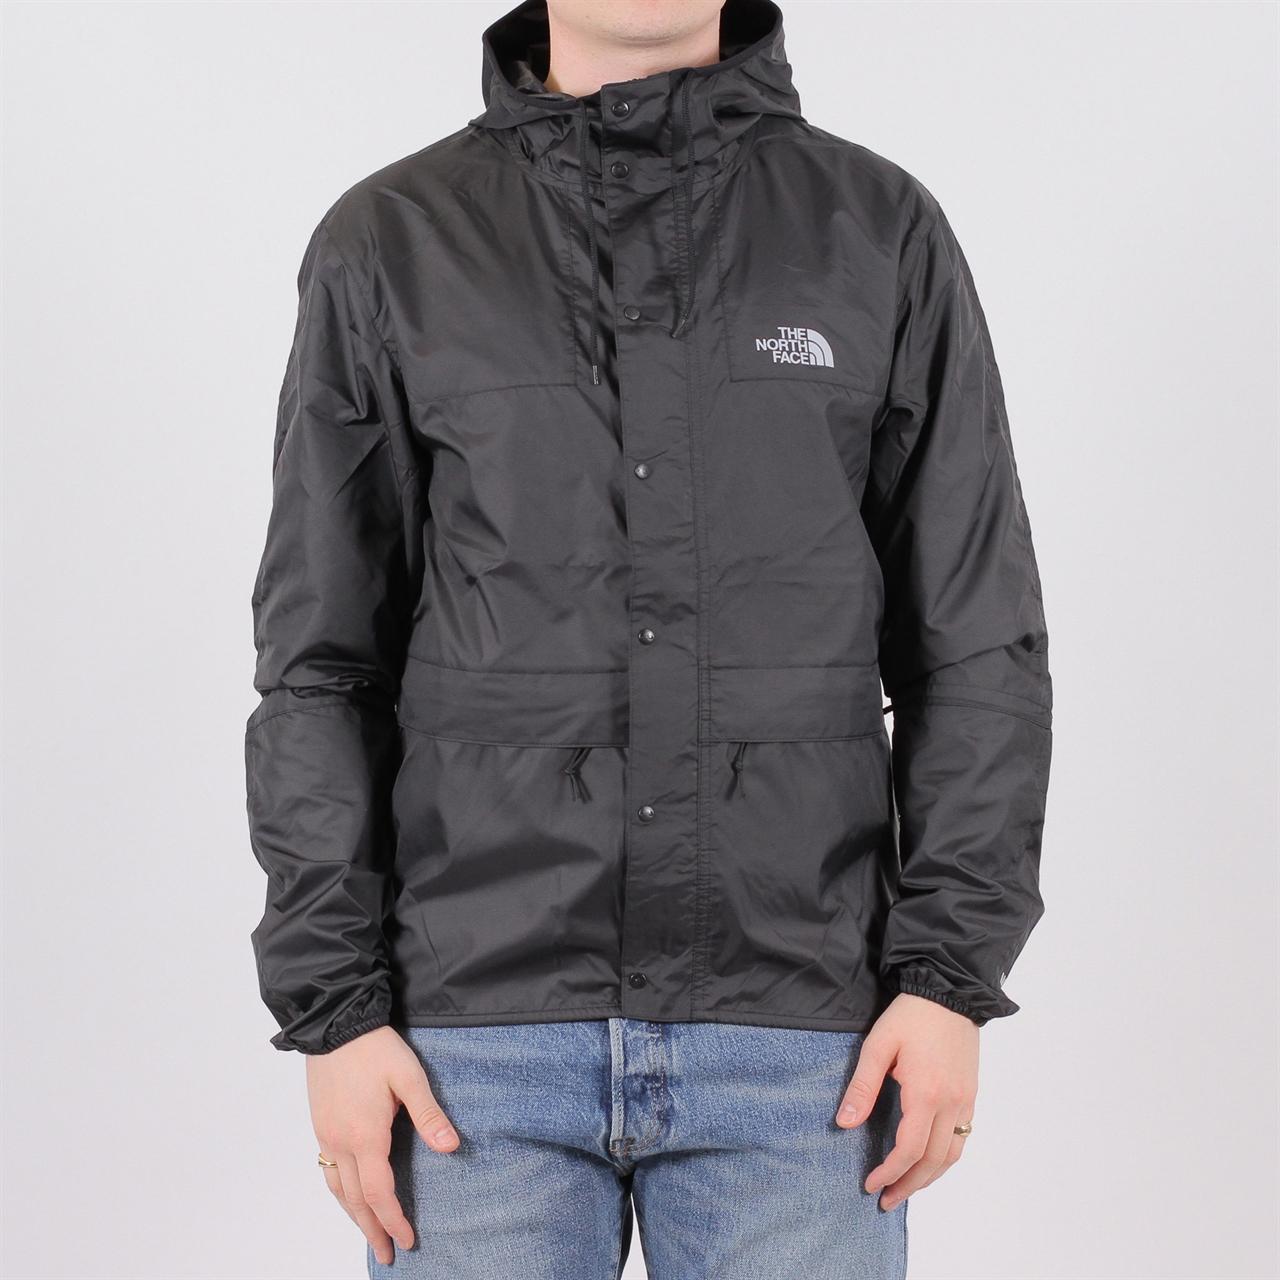 488e59e580 Shelta - The North Face 1985 Mountain Jacket Black (T0CH37C4V)